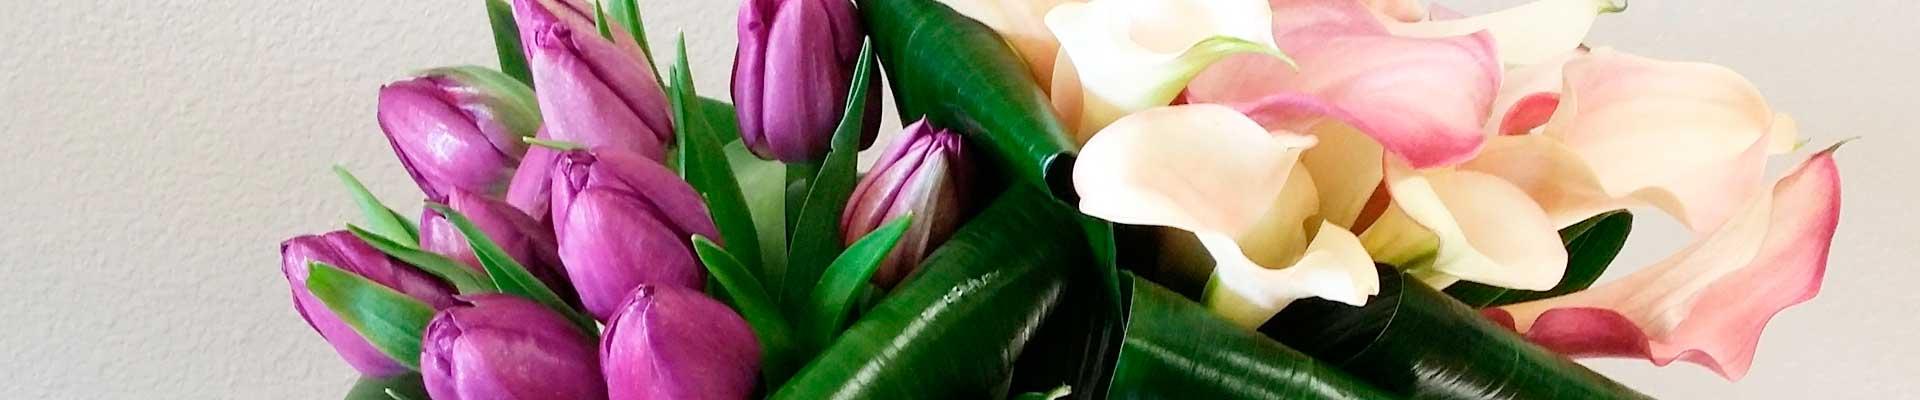 flores para empresas